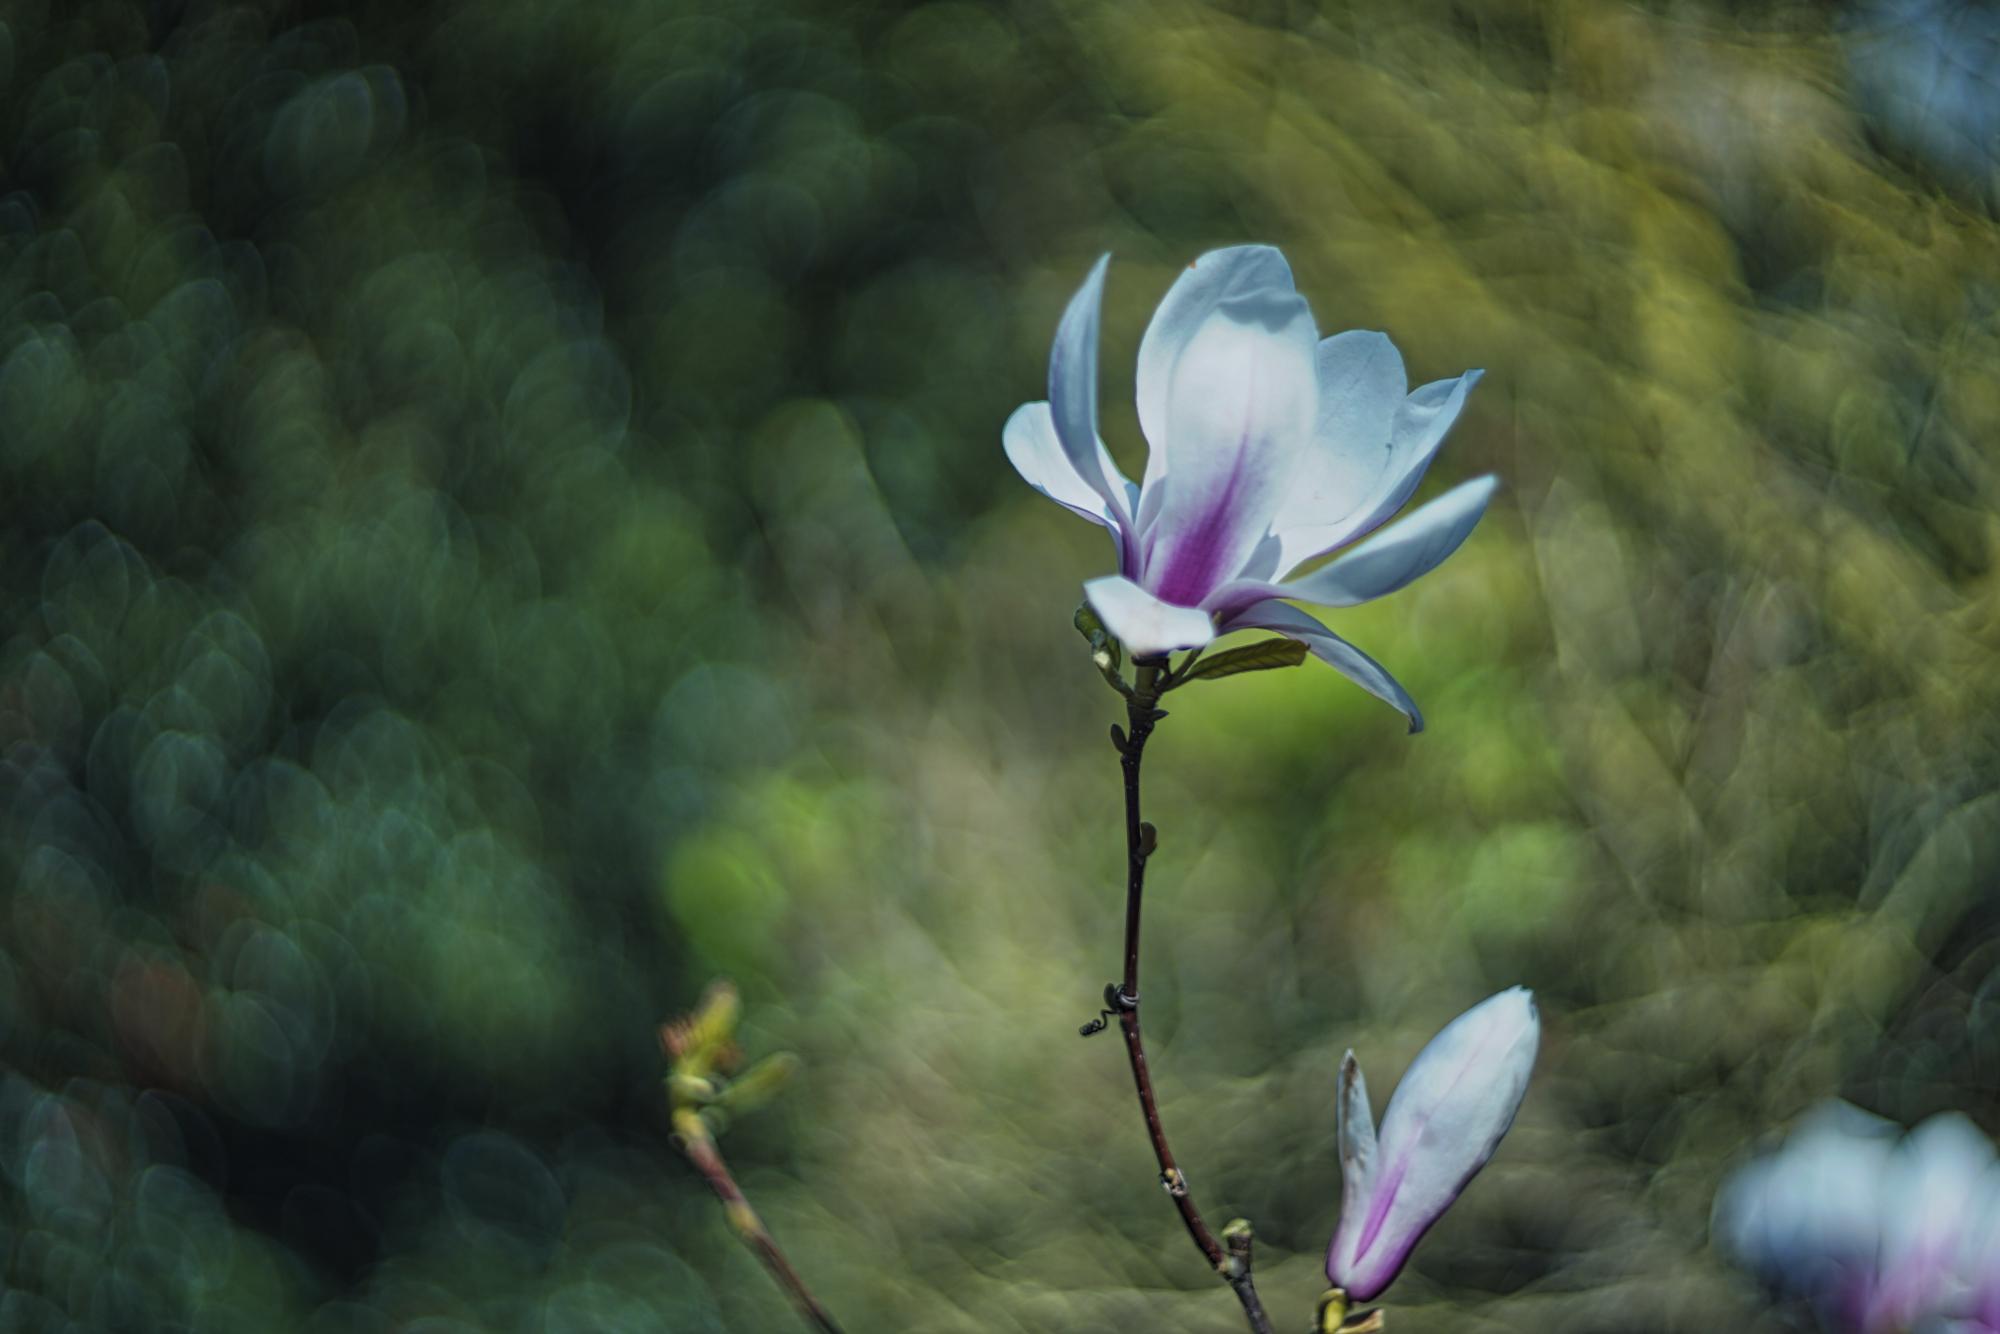 DSC02725©Uchujin-AdrianStorey-210320